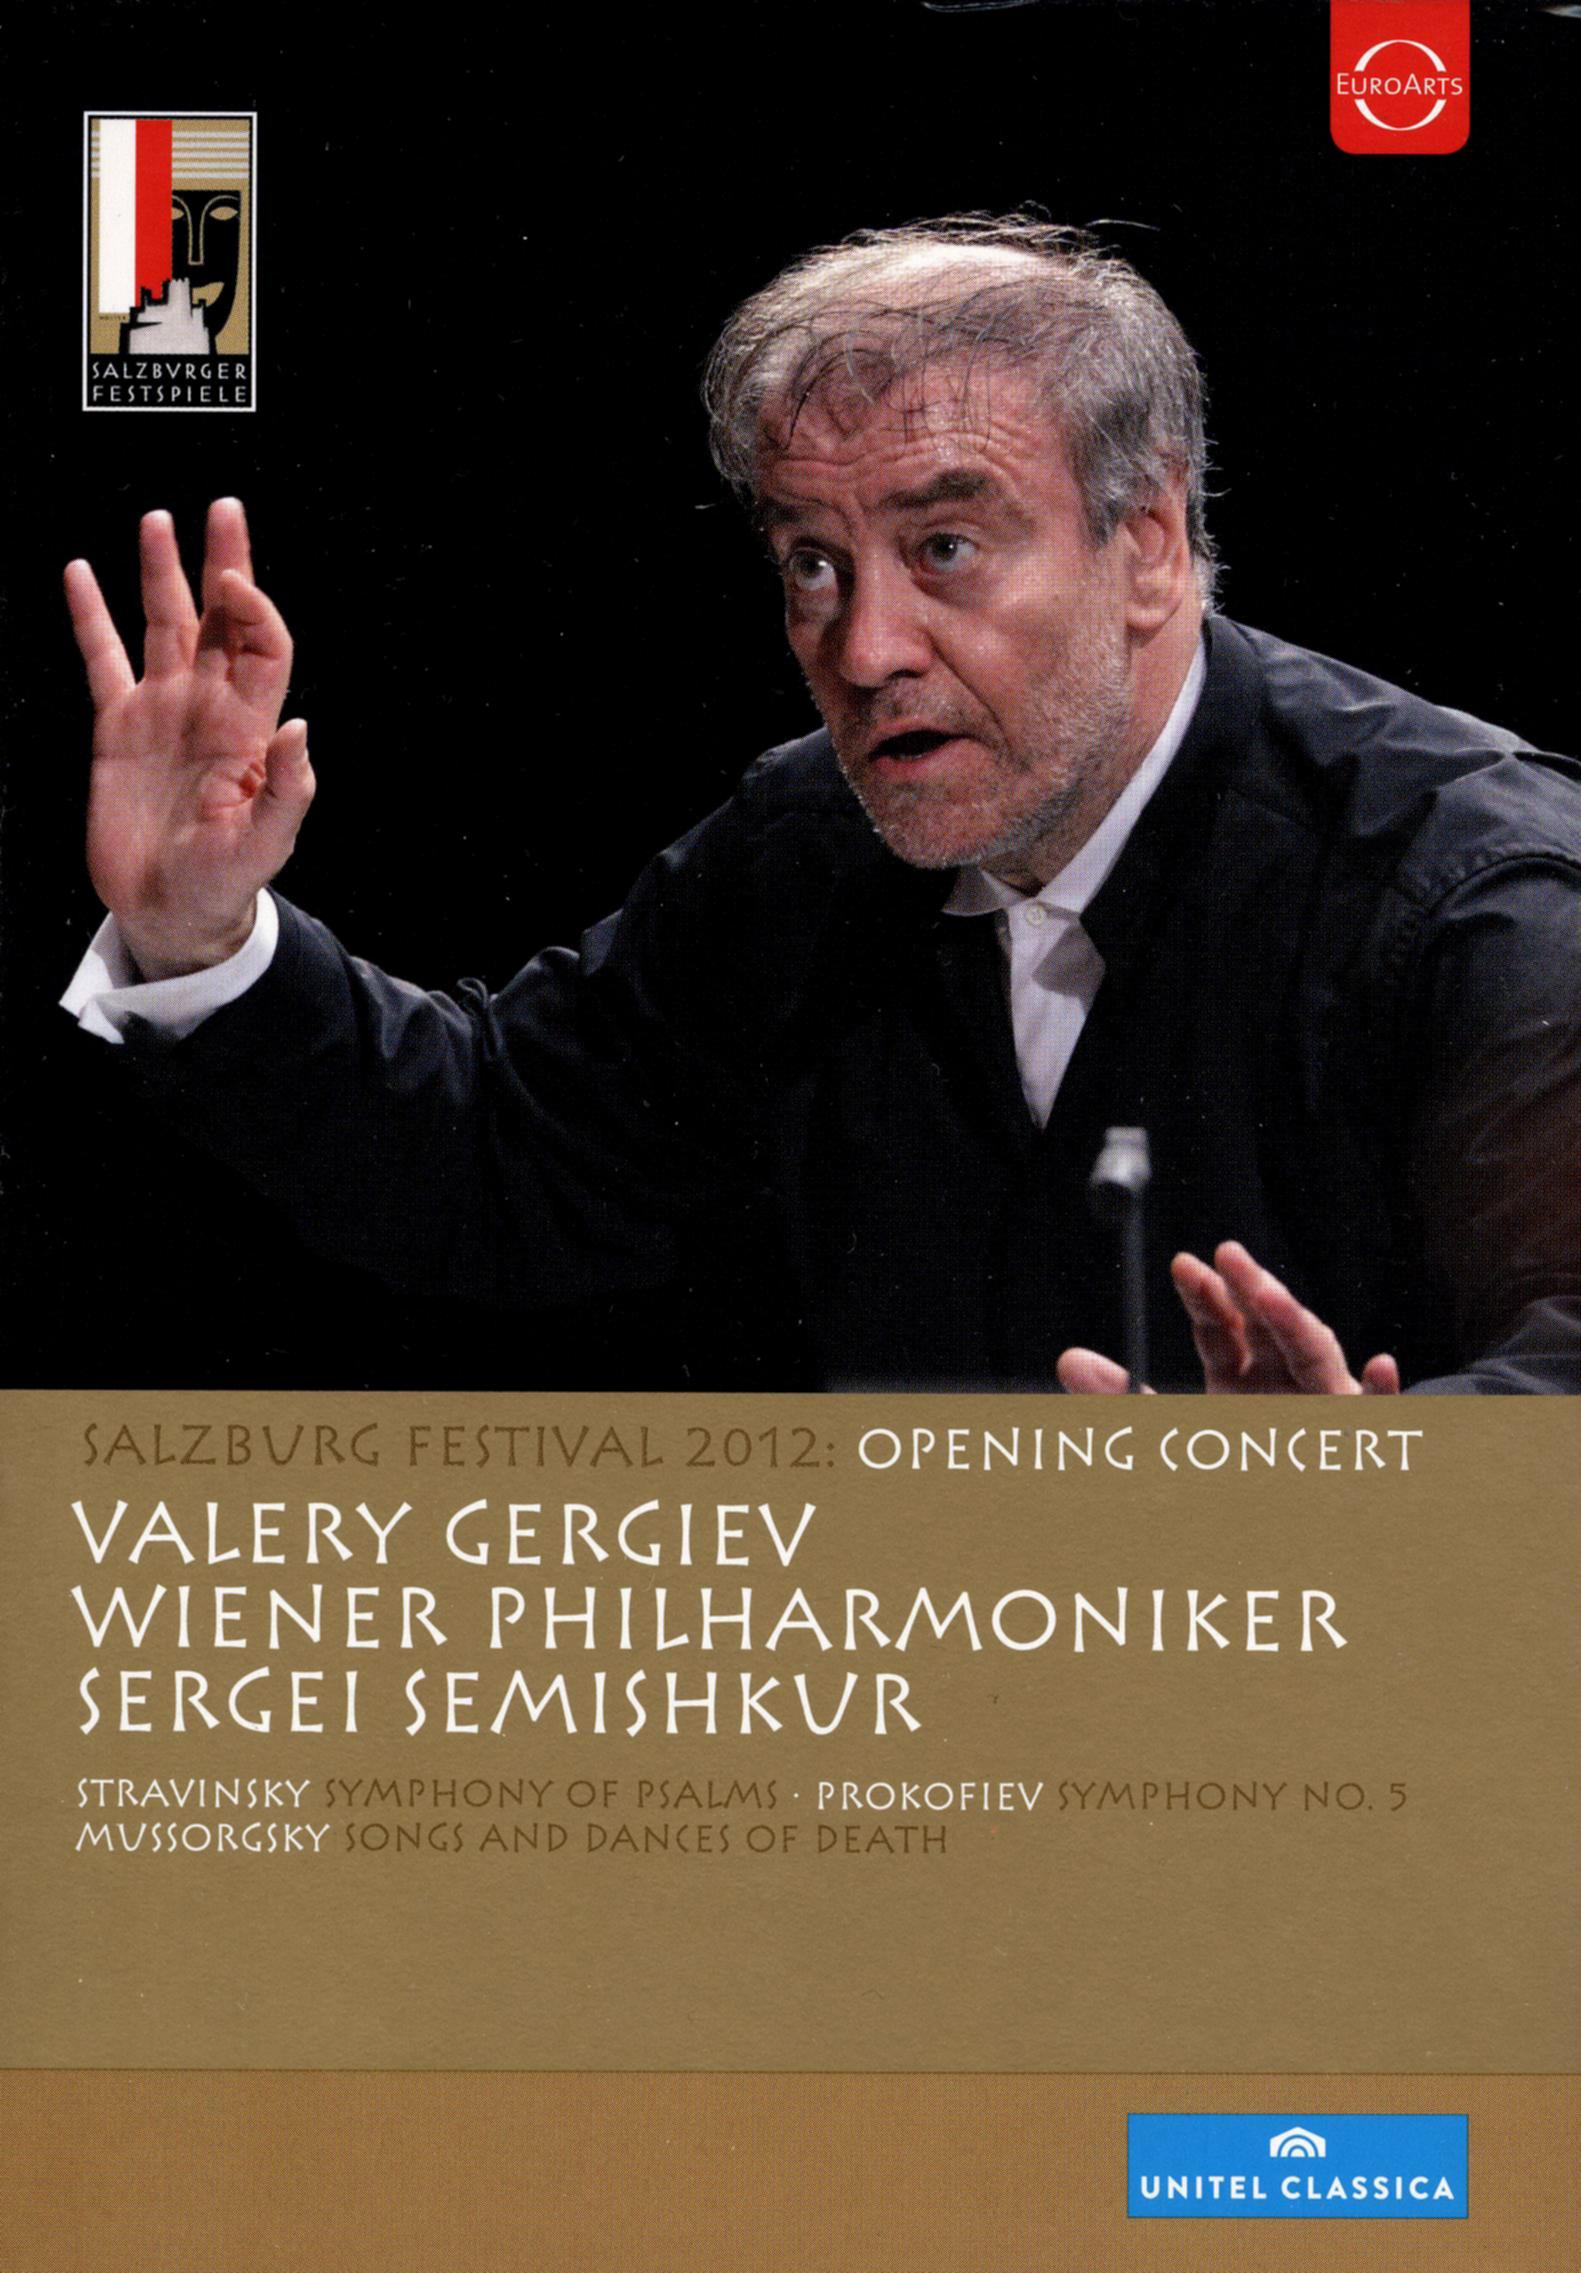 Salzburg Festival 2012: Opening Concert - Stravinsky/Prokofiev/Mussorgsky